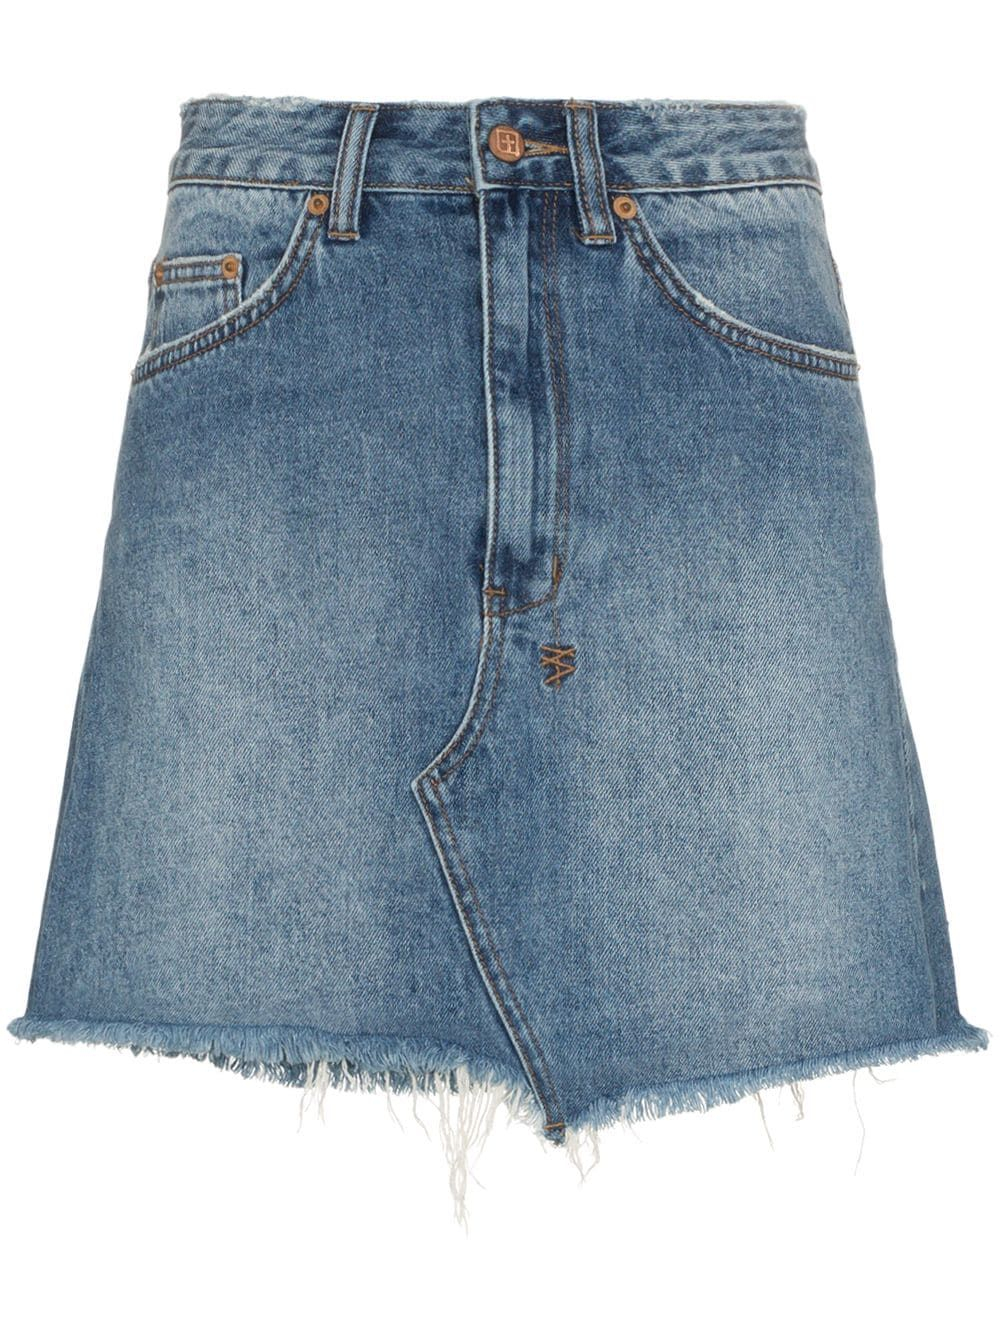 fe636ac3e630 Shop Ganni Meranti utility pocket leather wrap skirt | Skirts in 2019 |  Mini skirts, Leather mini skirts, Skirts